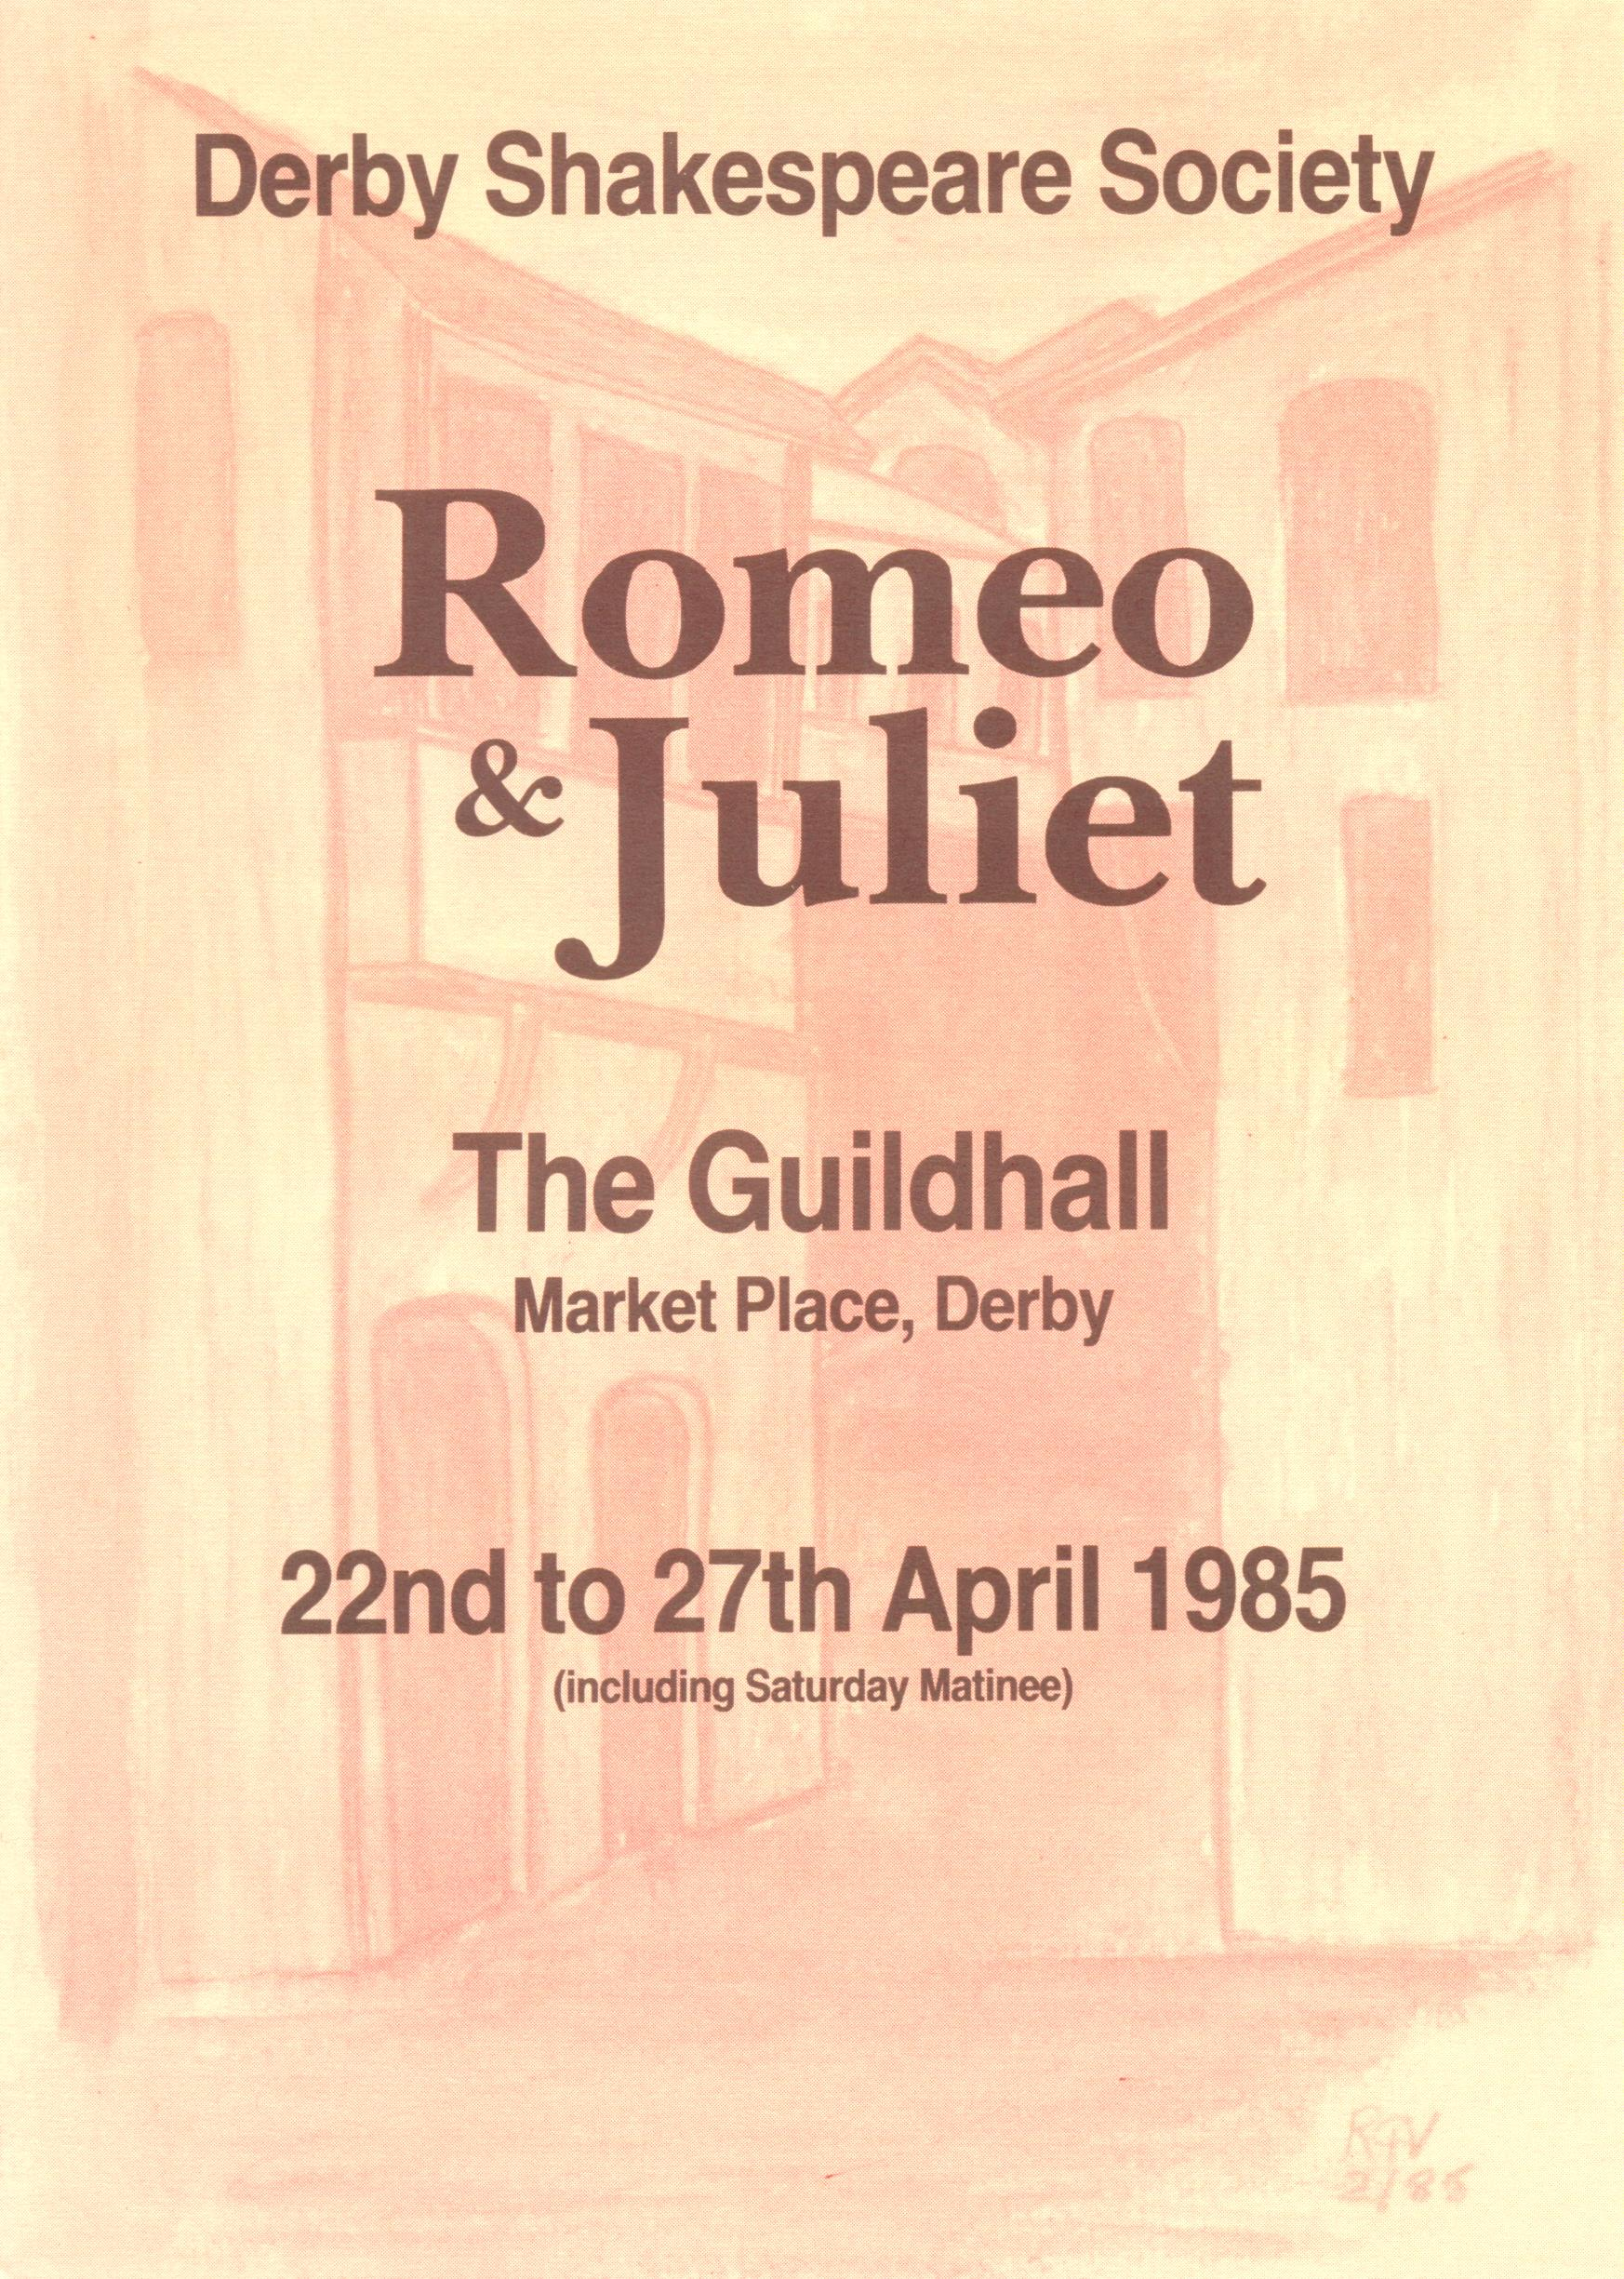 'Romeo & Juliet' 1985